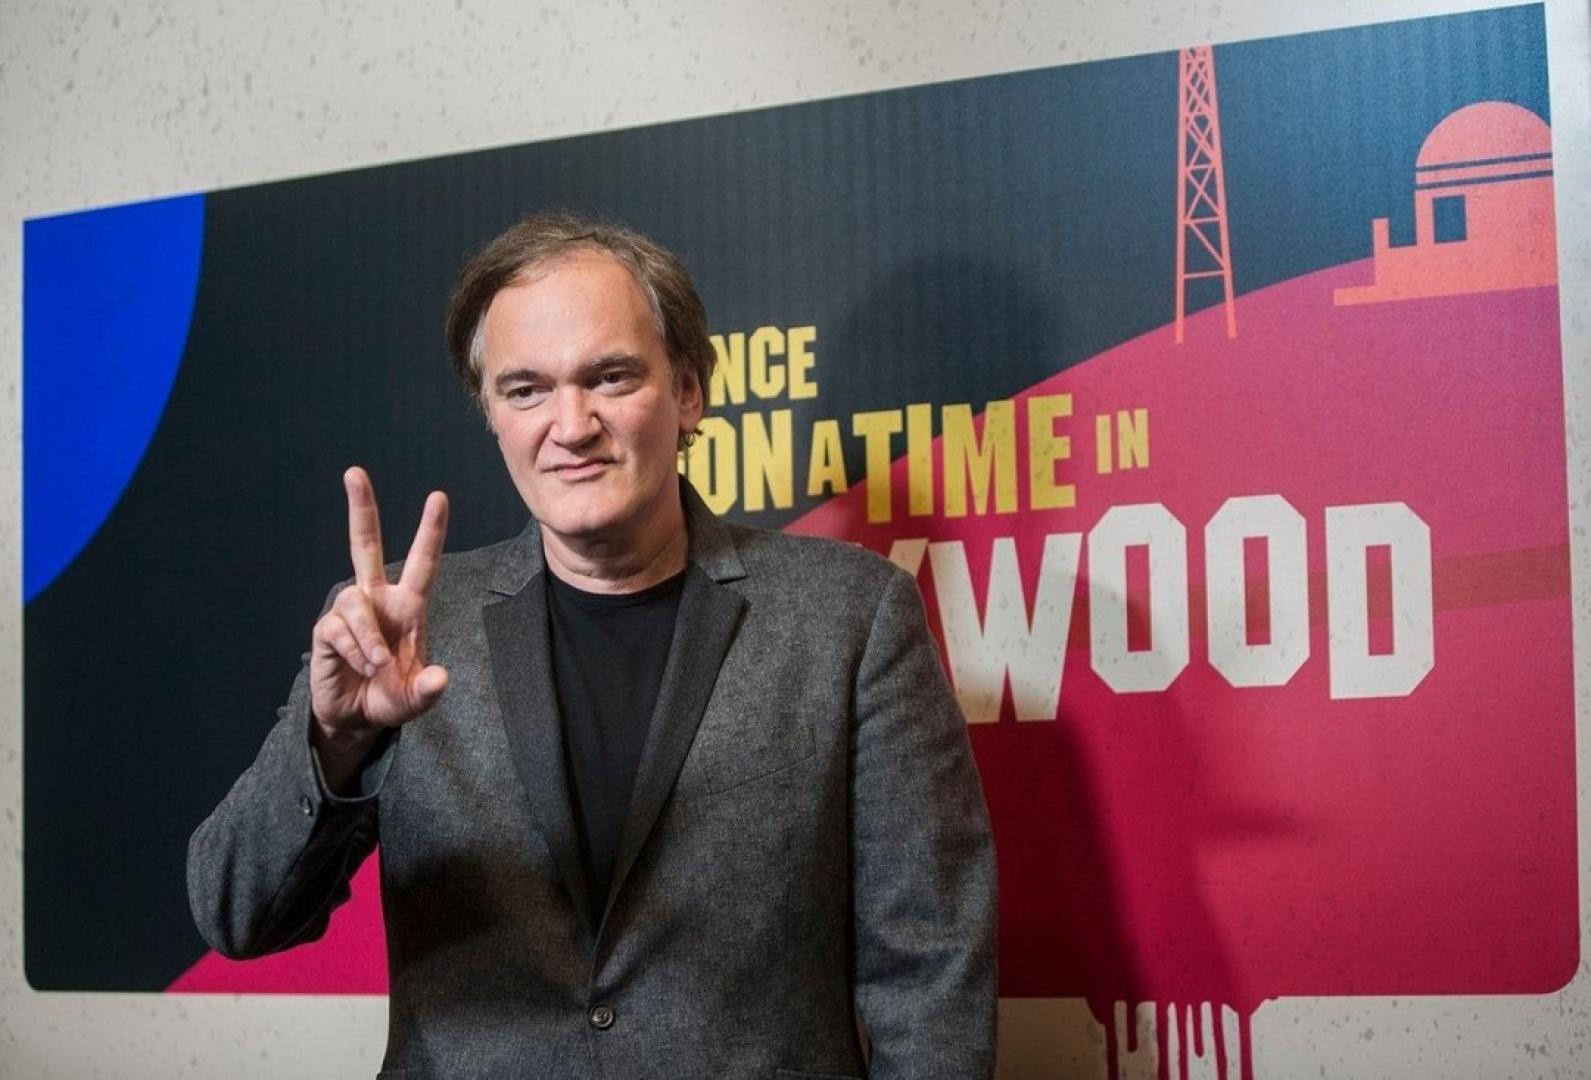 Új bemutató dátumot kapott Tarantino filmje